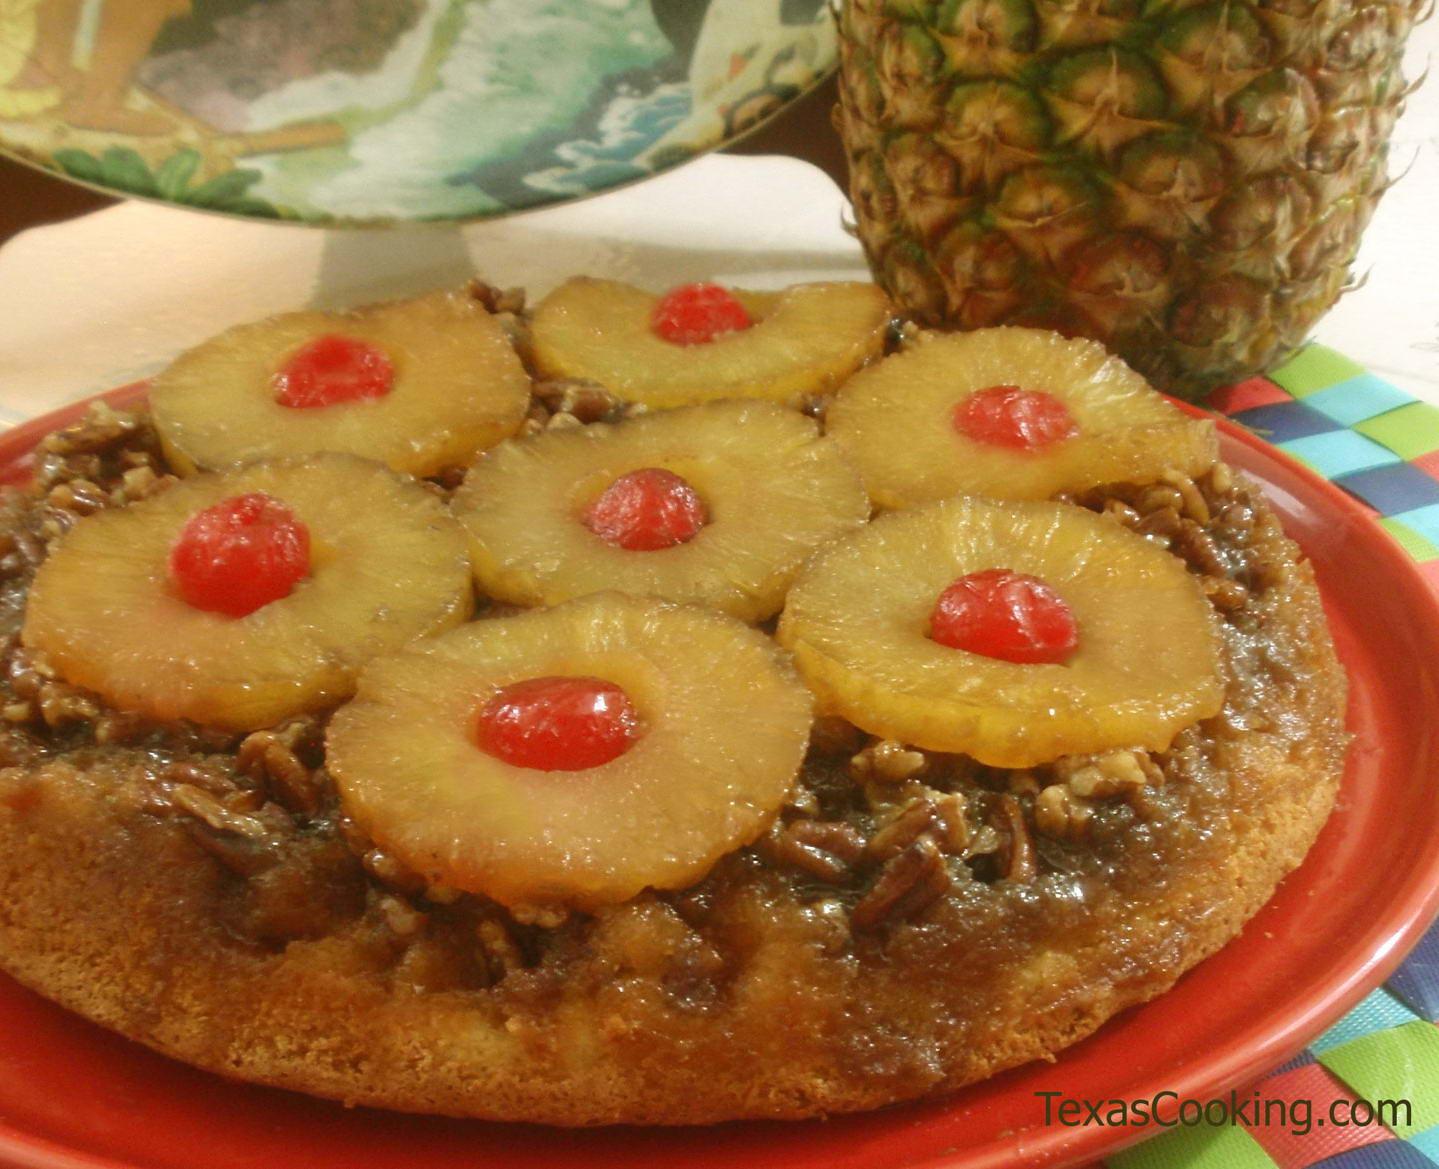 Homemade Pineapple Upside Down Cake  Pineapple Upside Down Cake Recipe